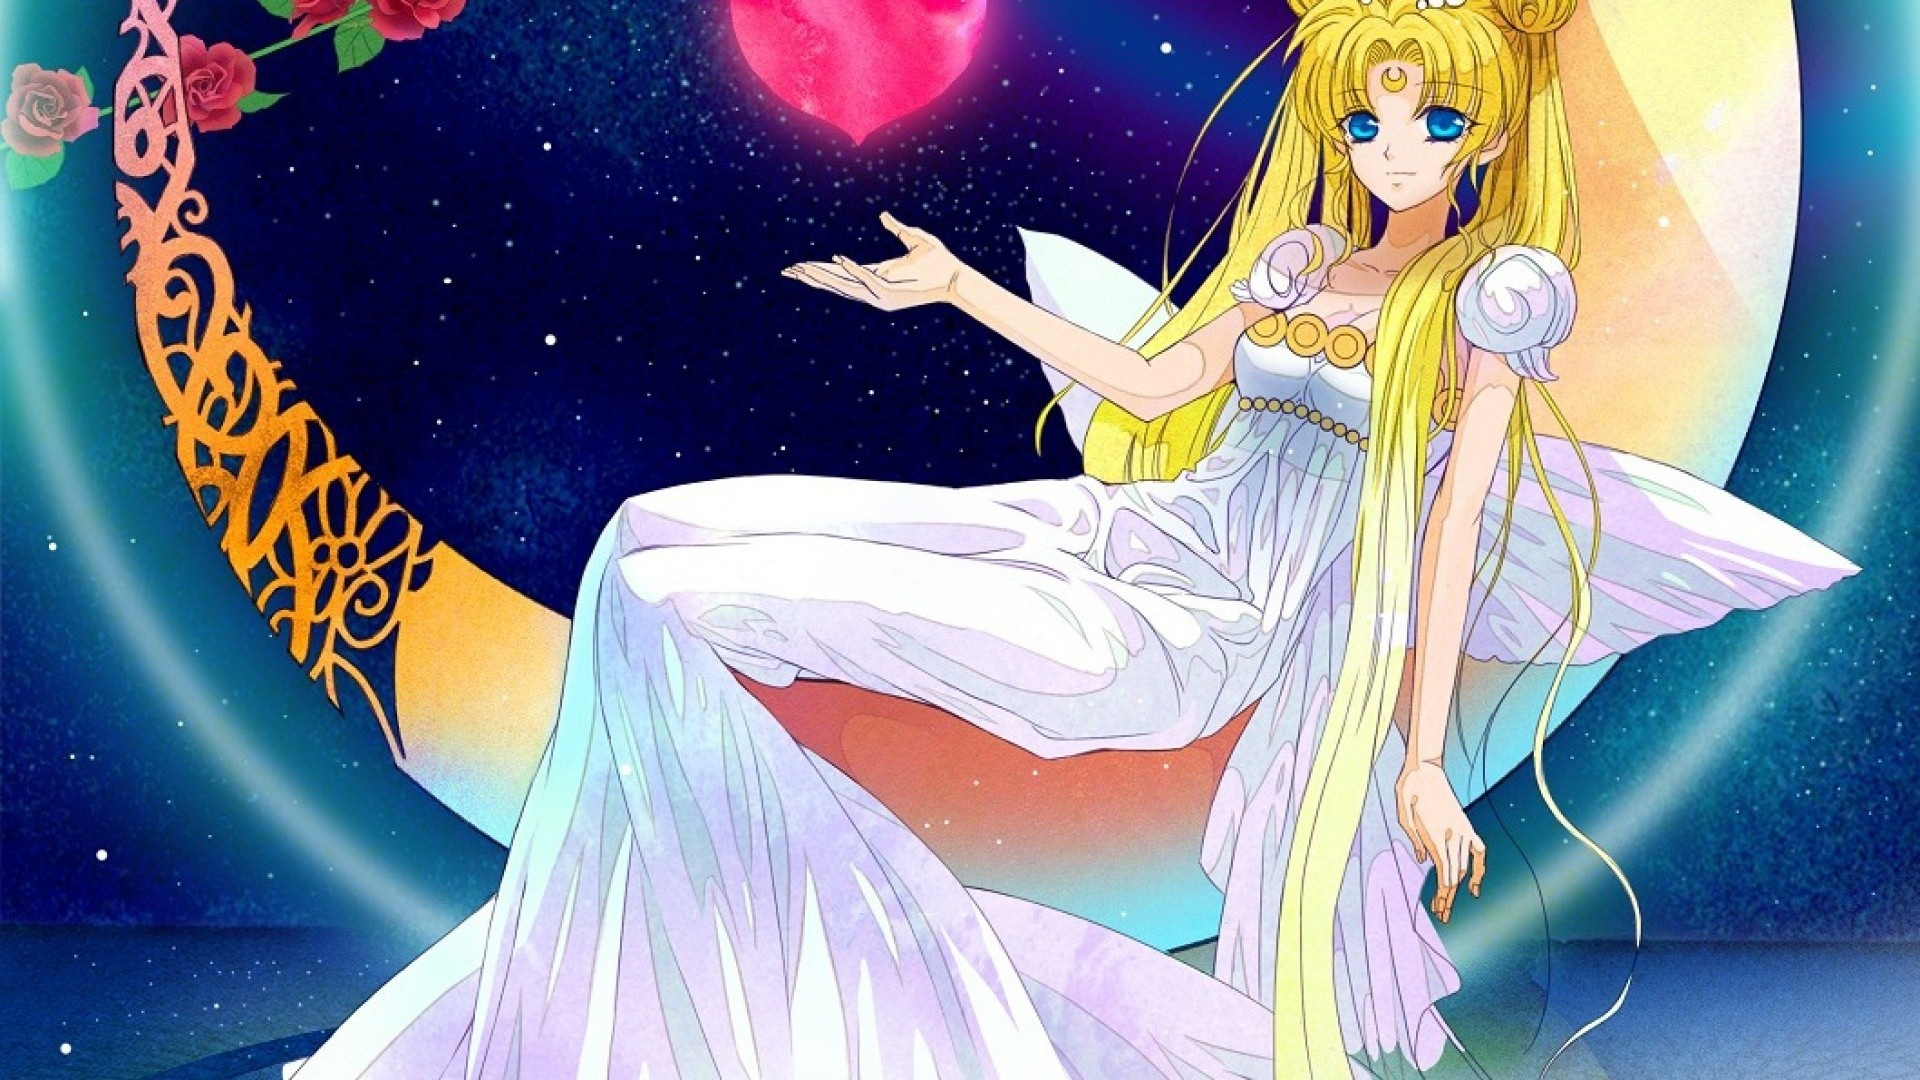 Sailor Moon Wallpaper image hd